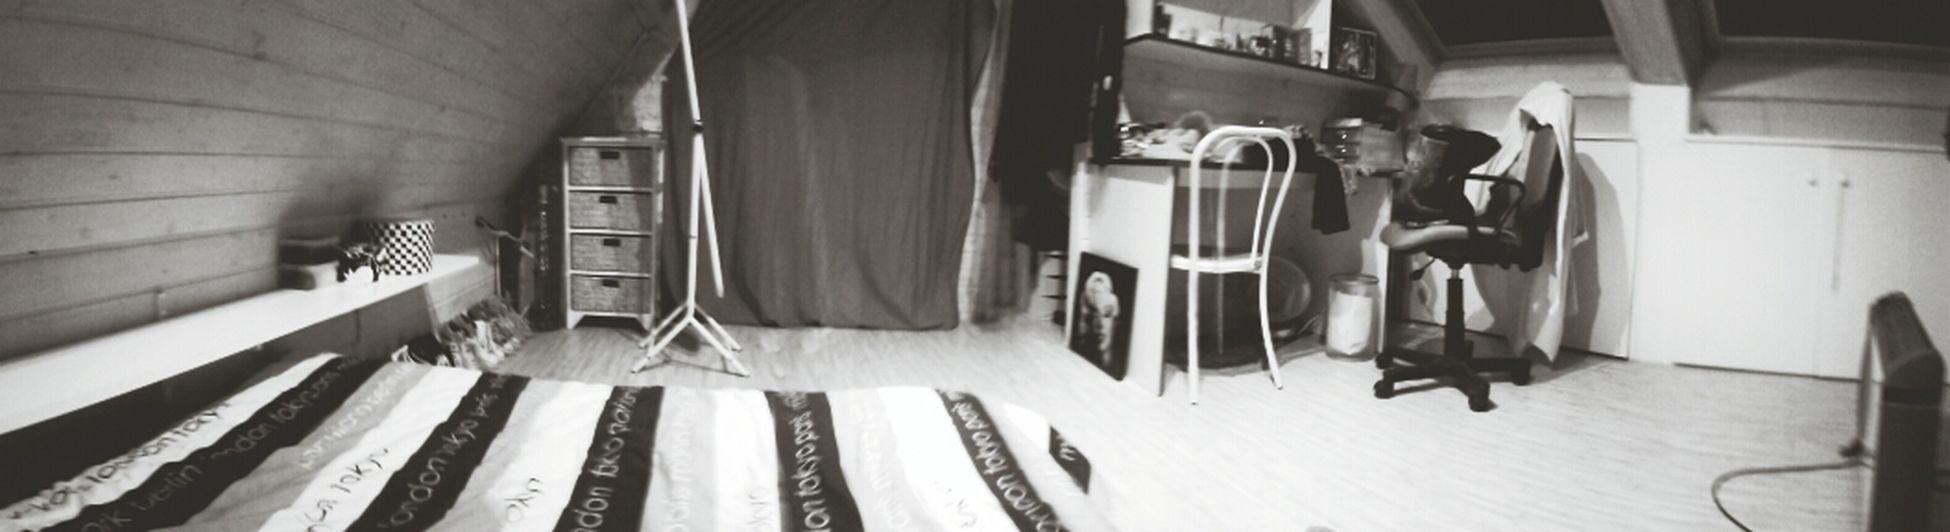 chambre parfaite Changement Lovelife